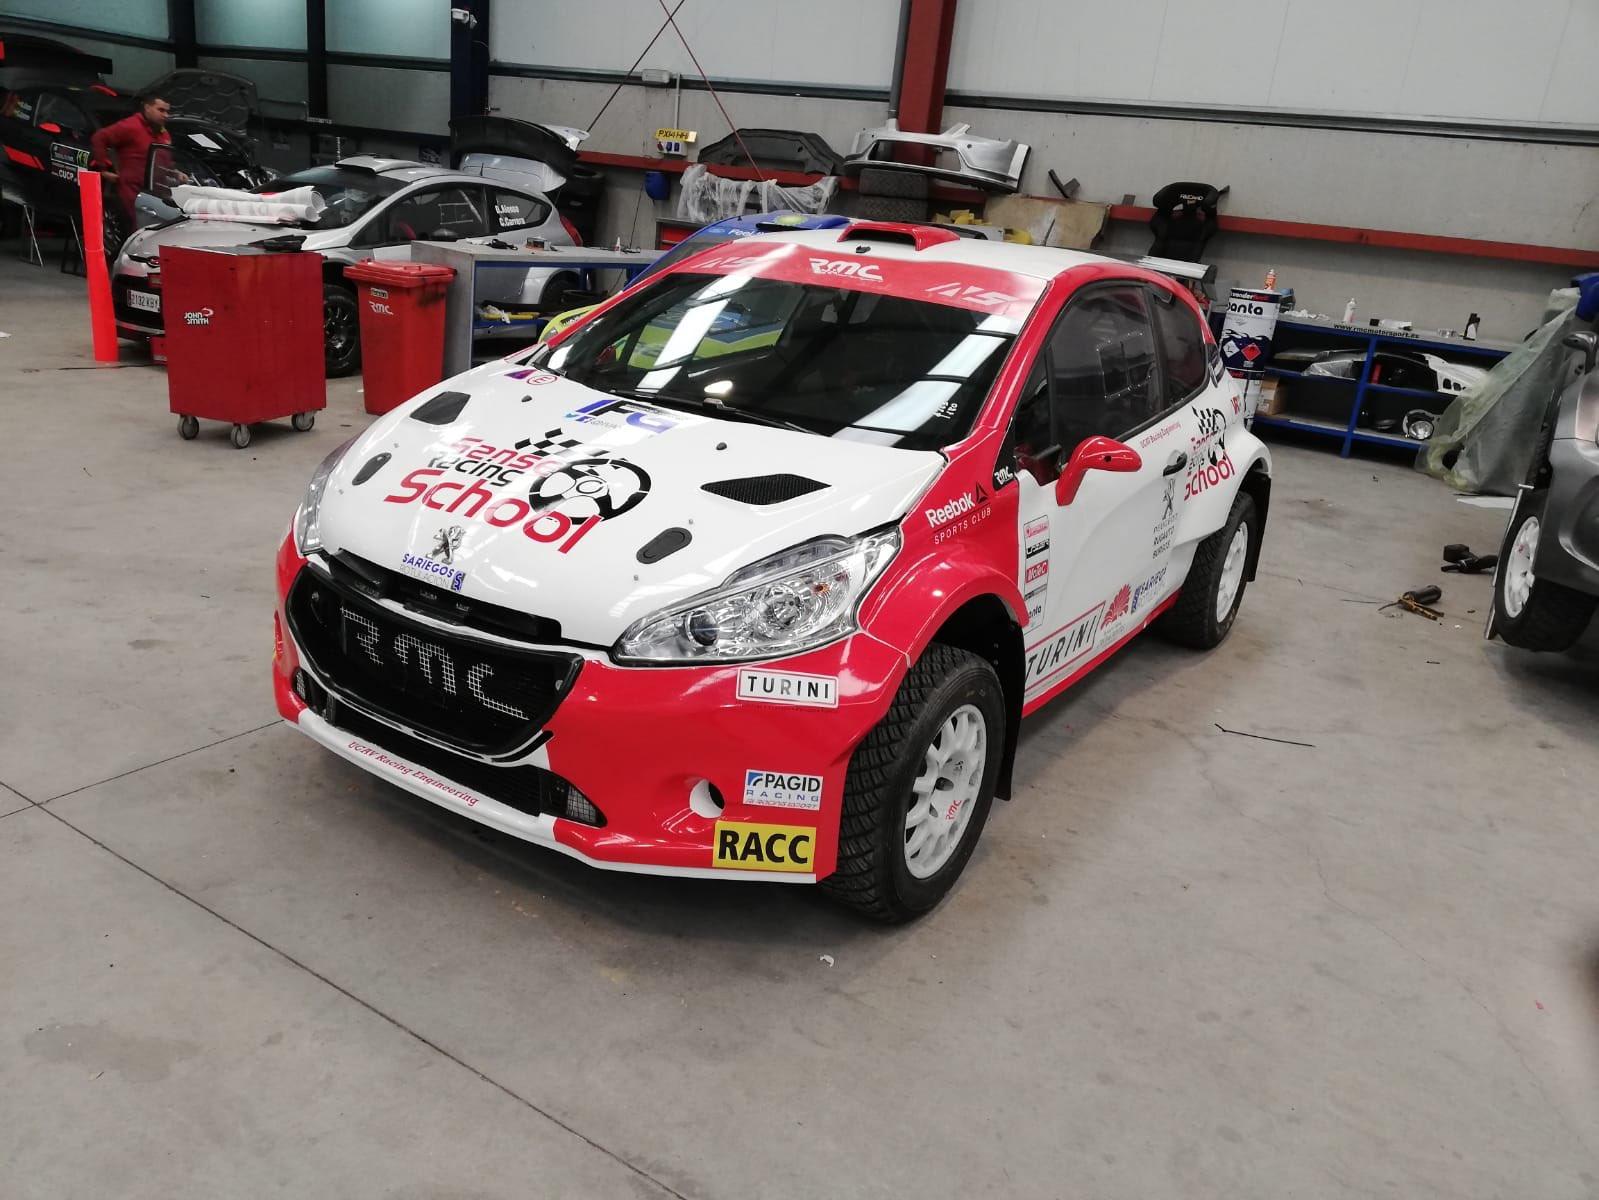 SCER + CERT: VIII Rallye Tierras Altas de Lorca [8-9 Marzo] D0_ibcBXgAEV7RS